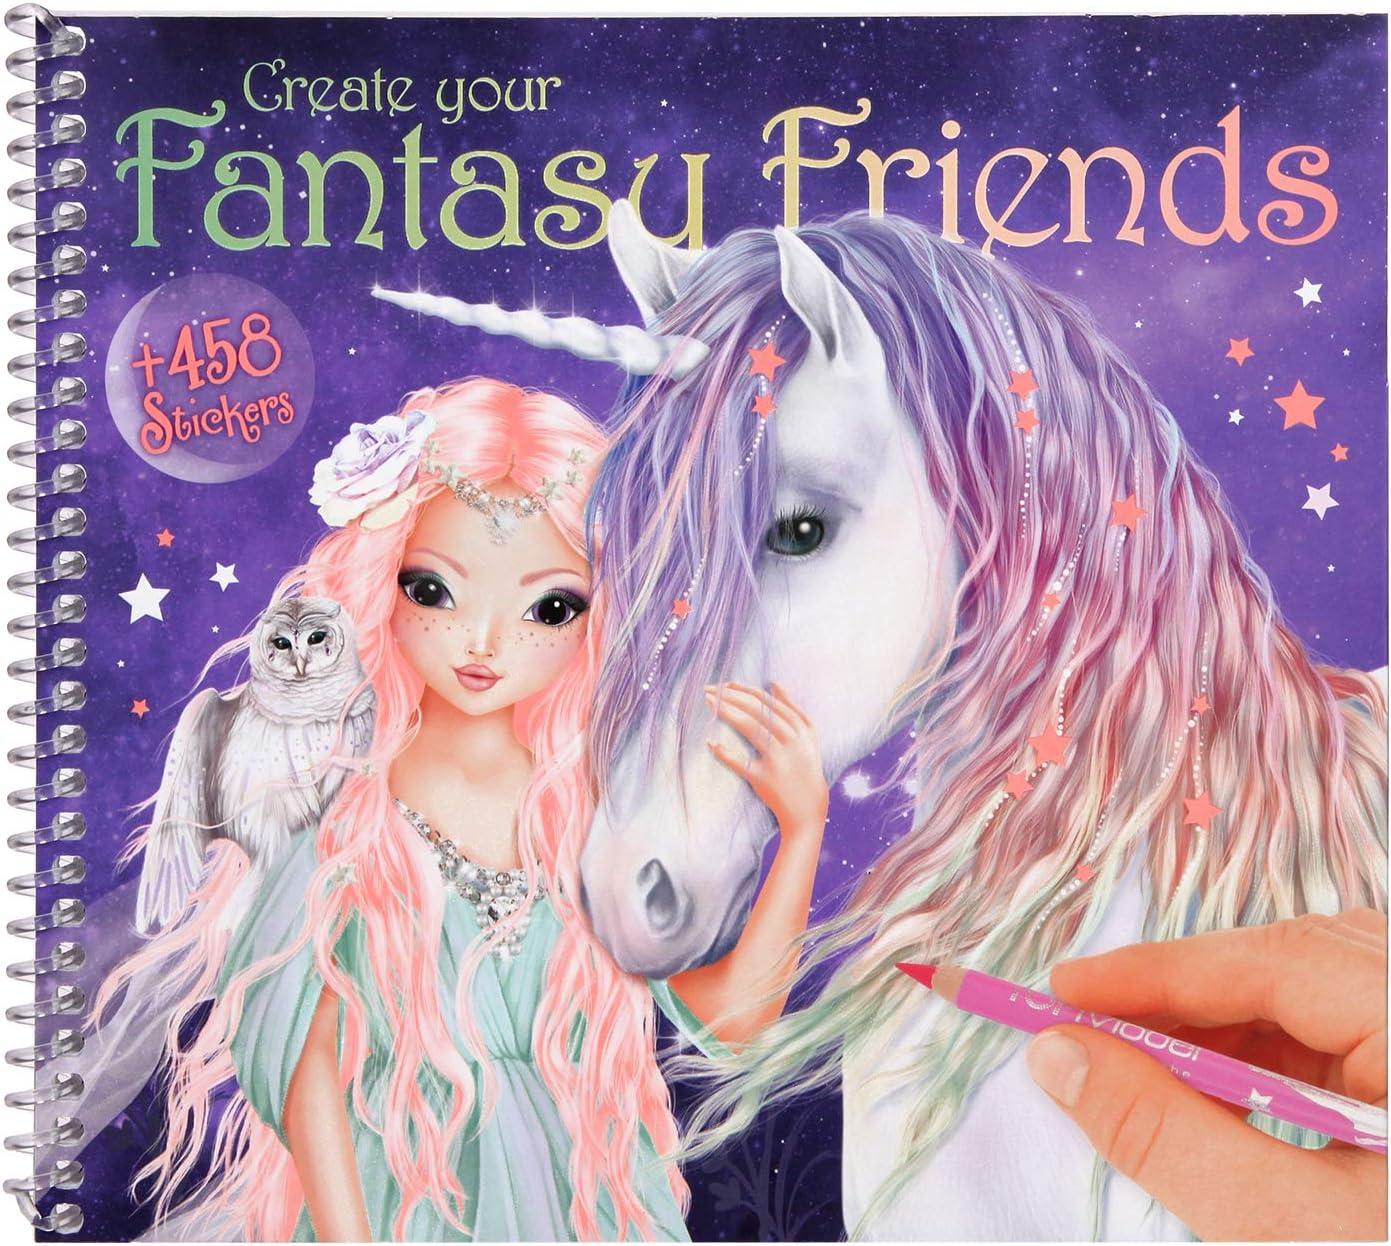 Top Model Malbuch Stickerbuch Create your Fantasy Model von Depesche